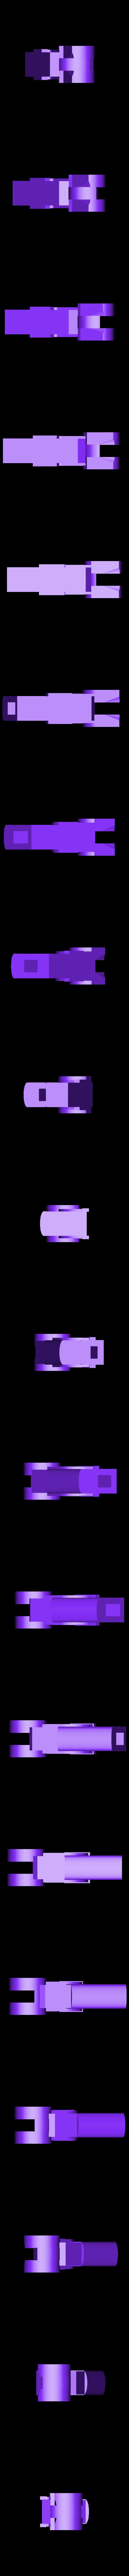 006_Harkonnen_Body1.stl Download free OBJ file Hellsing ARMS Anti-Tank Cannon - Harkonnen - Airsoft grenade launcher • 3D printing design, Snorri